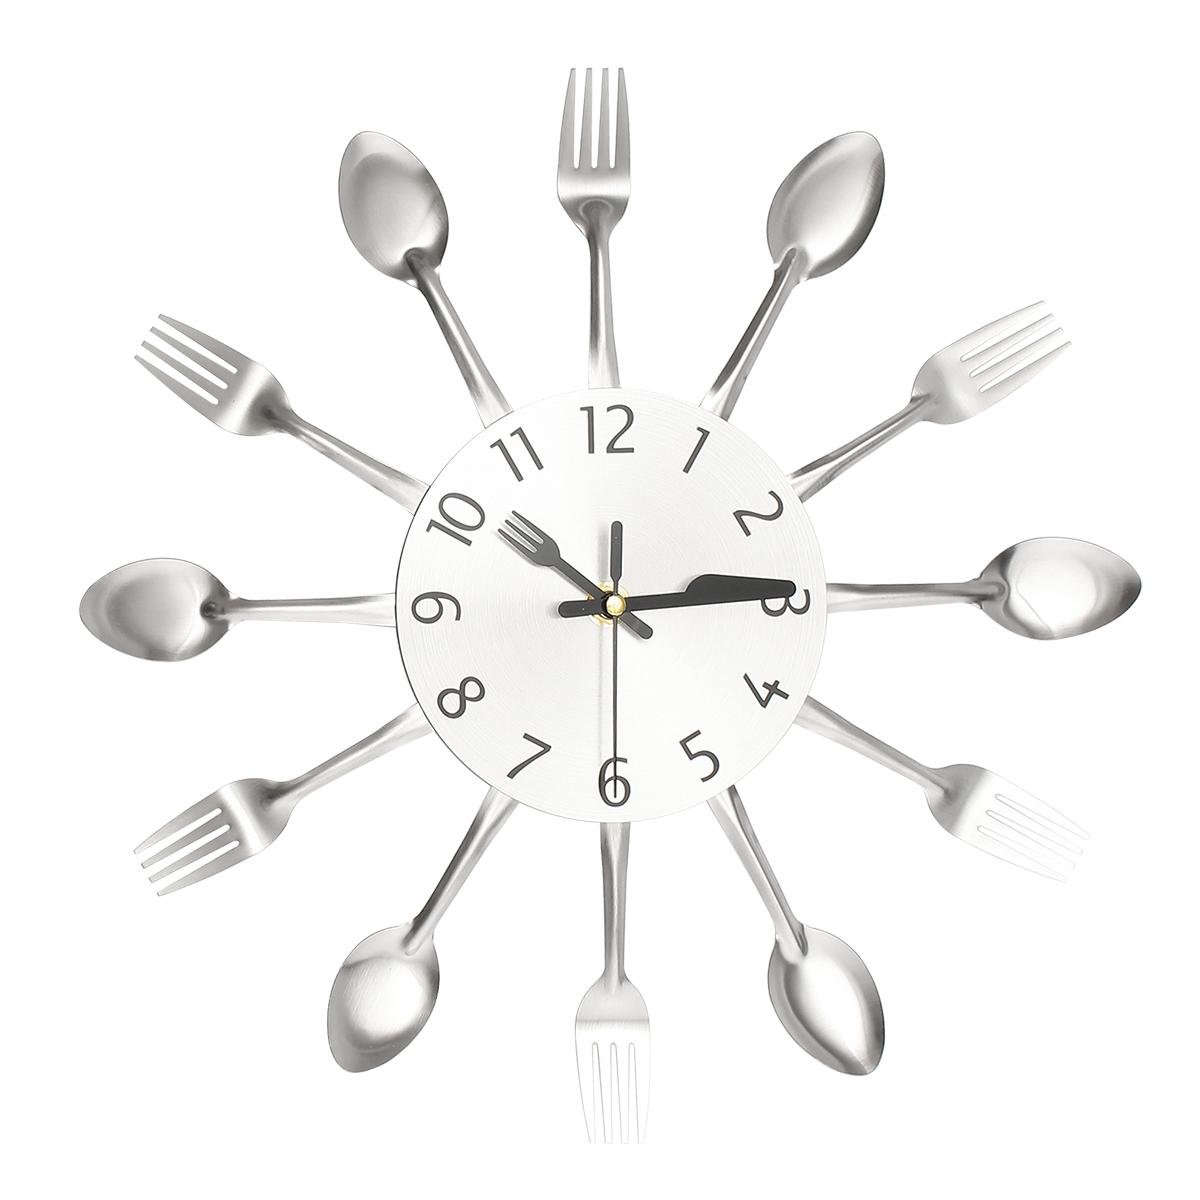 Horloge Mural Pendule Fourchette Cuillère Montre Clock Art Decor